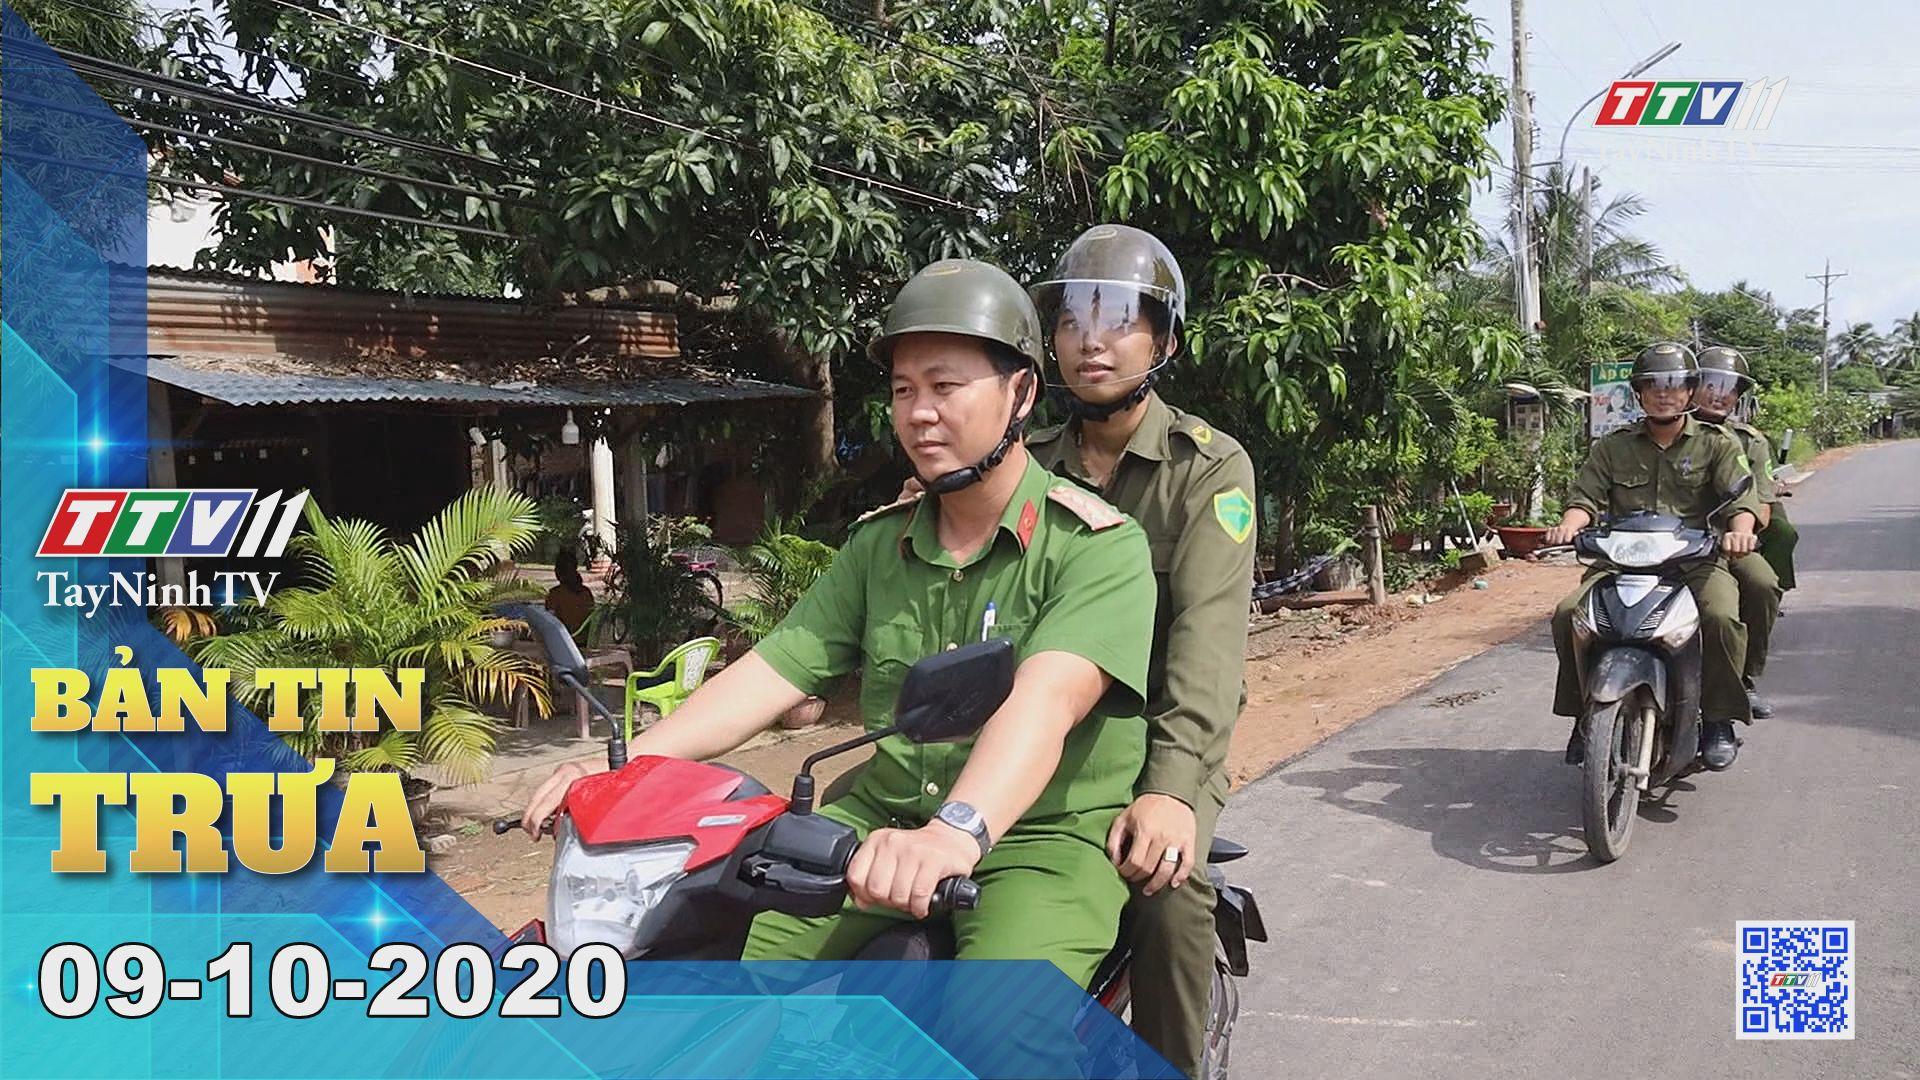 Bản tin trưa 09-10-2020 | Tin tức hôm nay | TayNinhTV